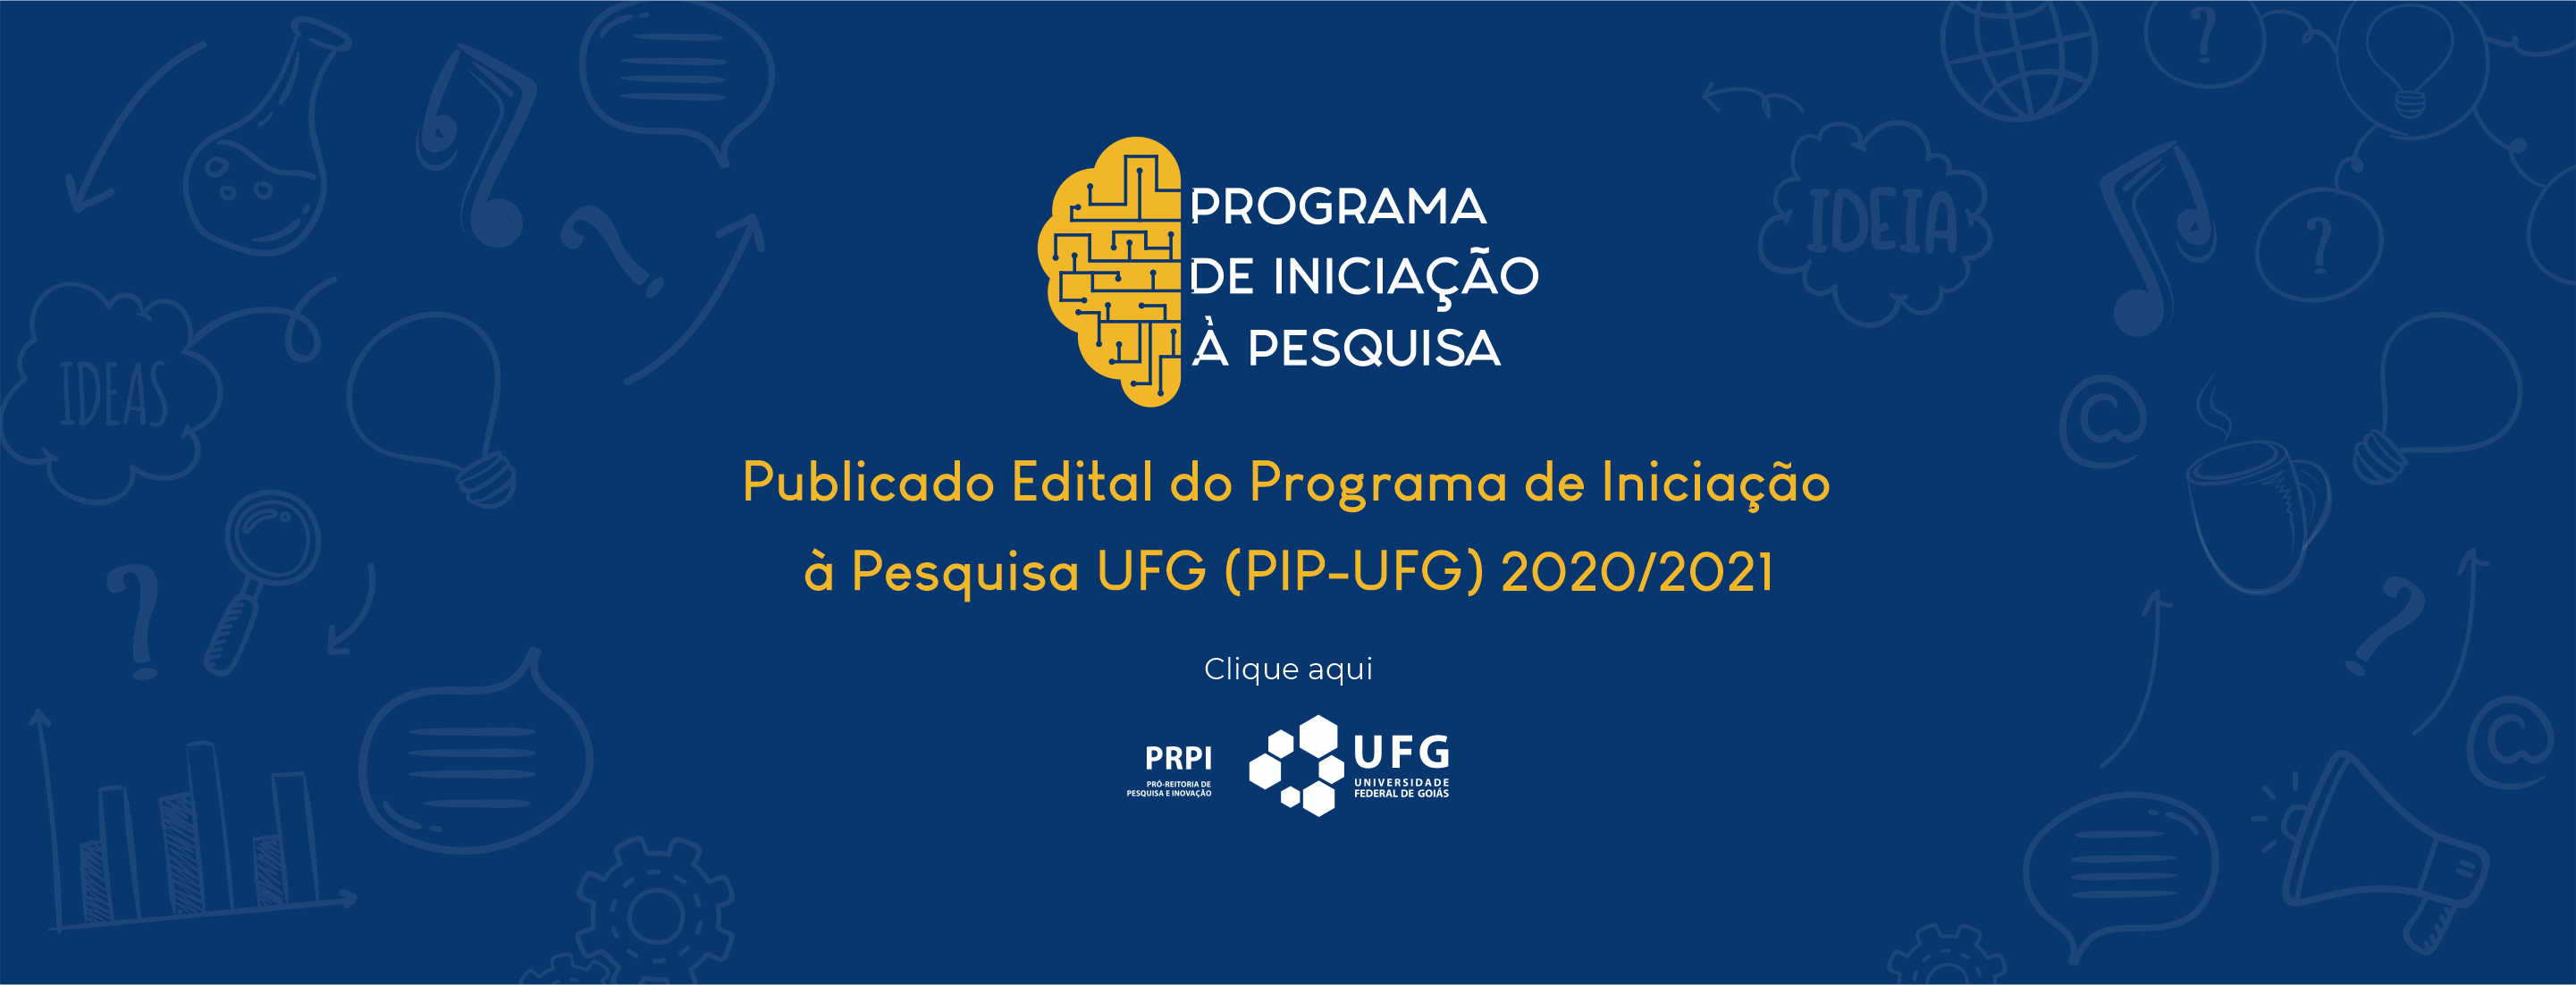 FullBanner_ProgramaDeIniciacaoAPesquisa_2020